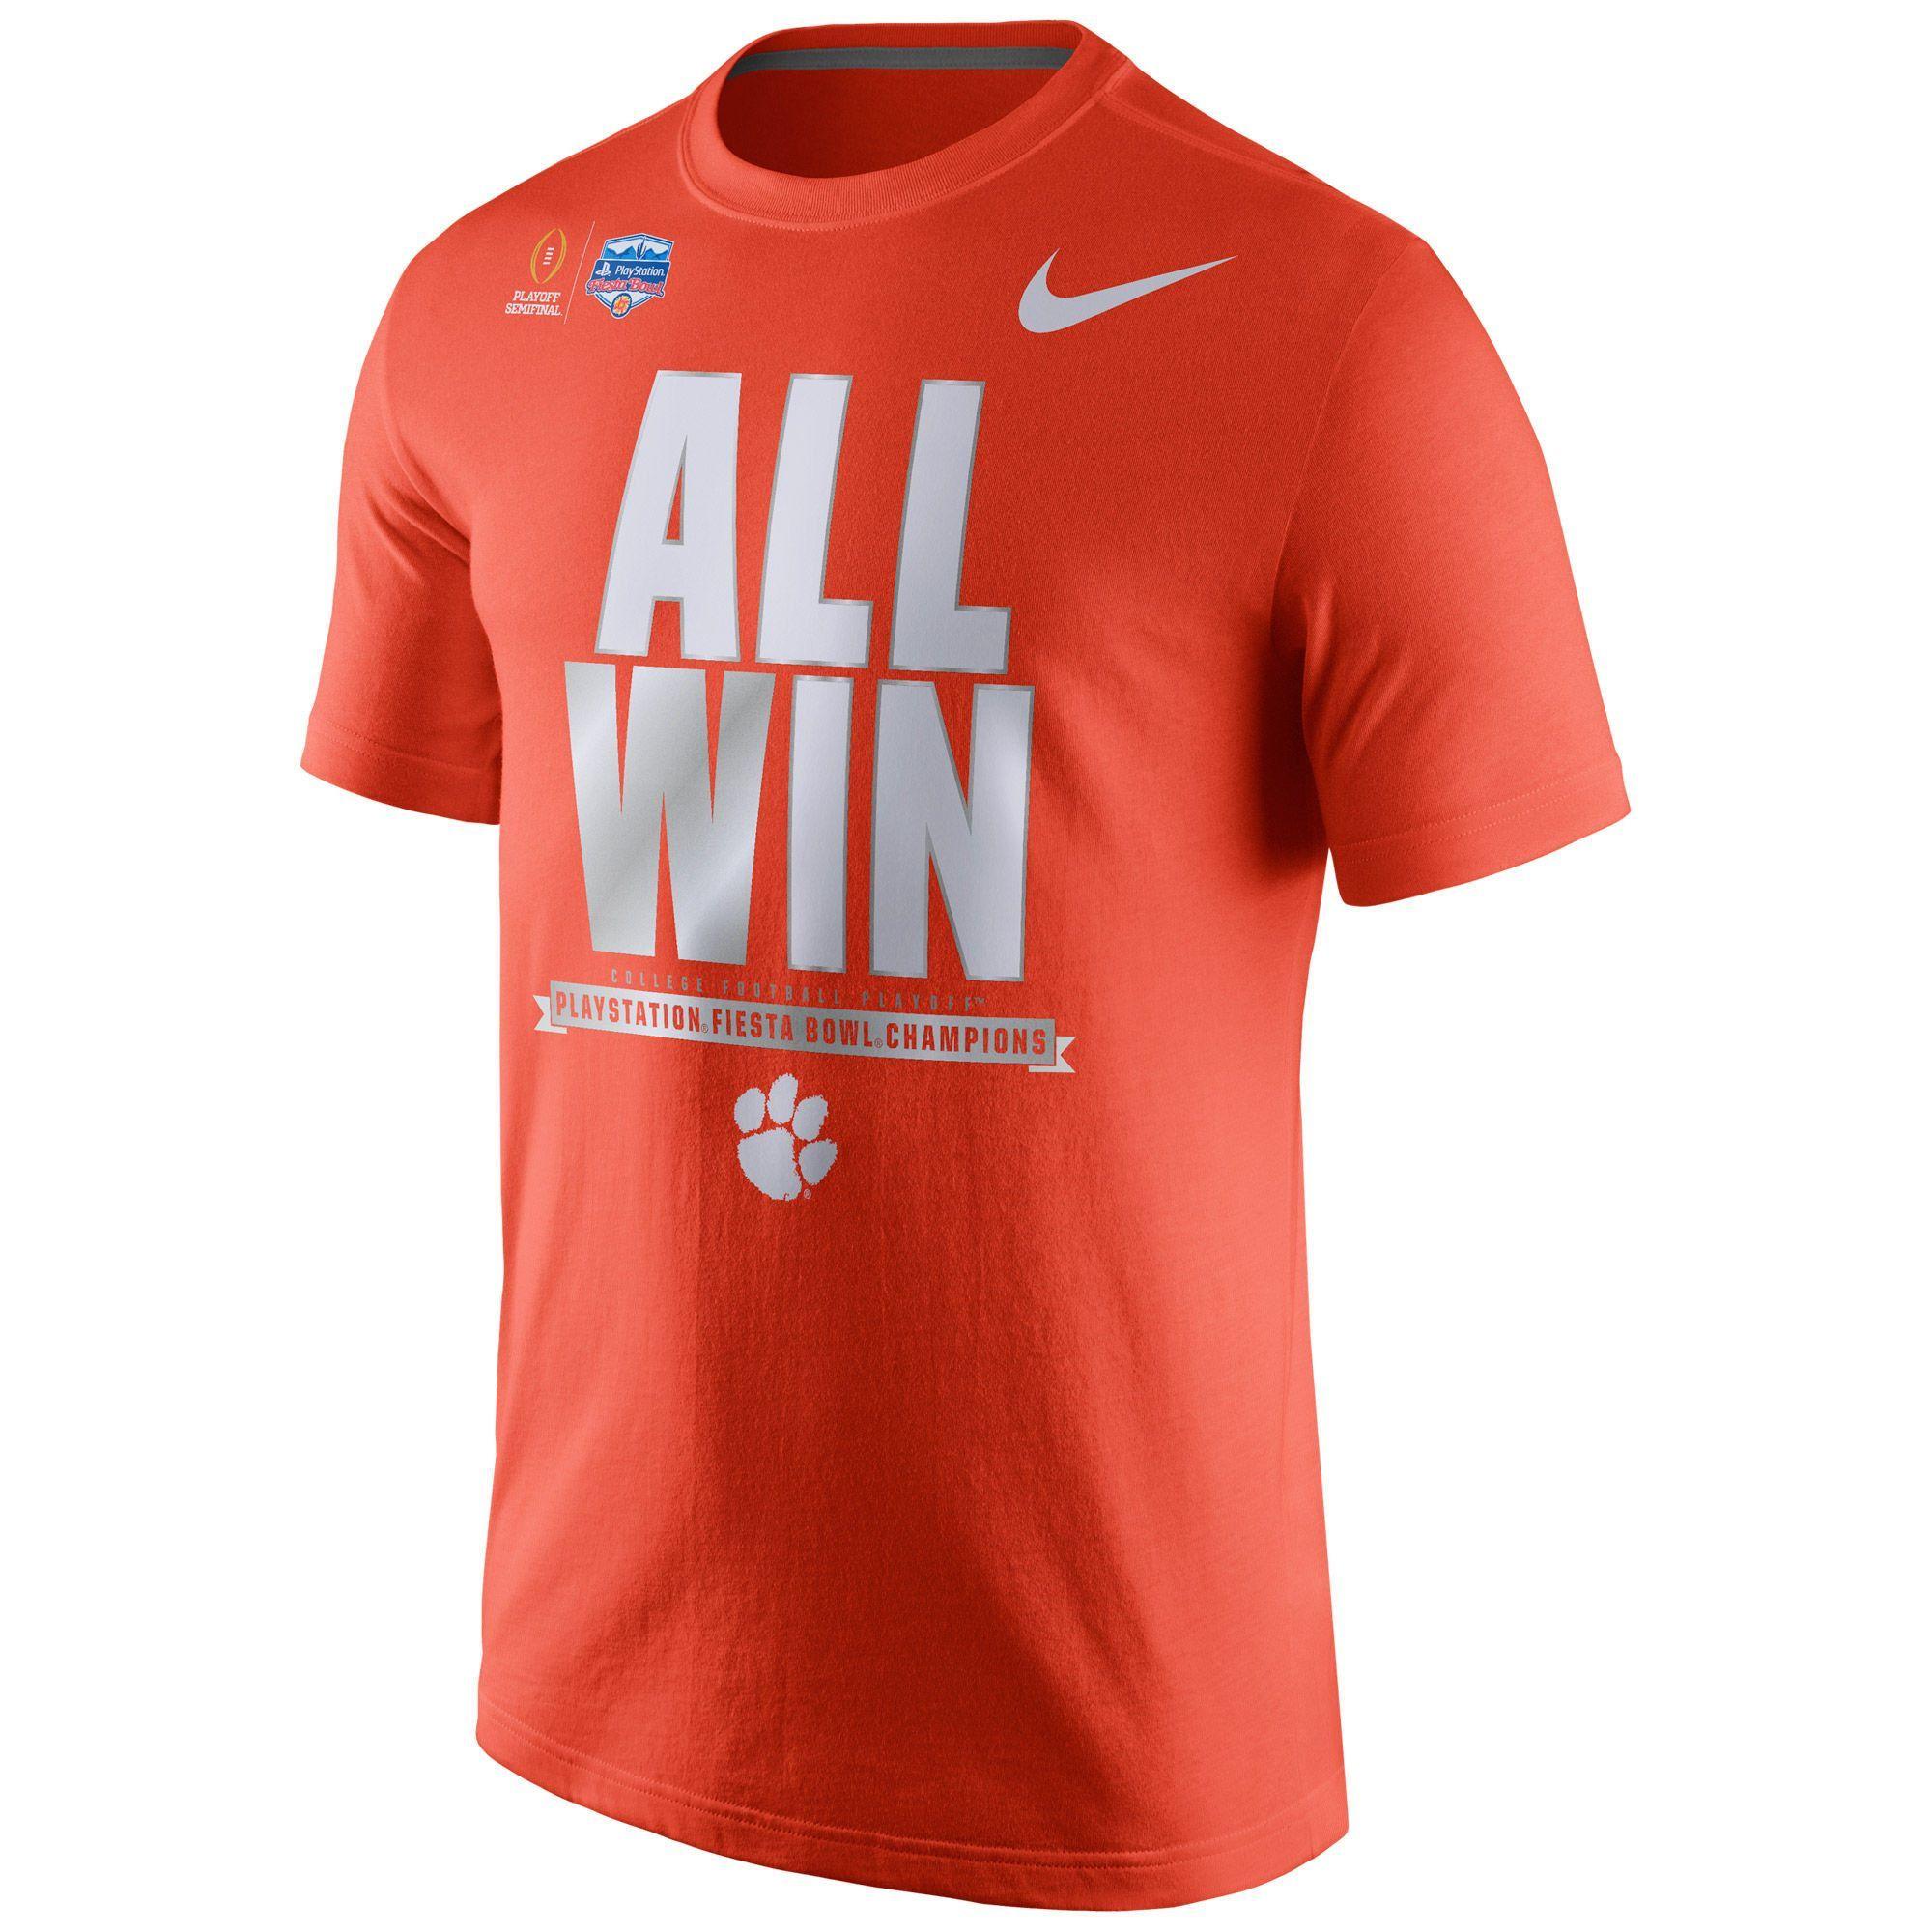 f10aec4c6aa8 Clemson Tigers NIKE NCAA College Football Playoff 2016 Fiesta Bowl Champions  Locker Room T-Shirt